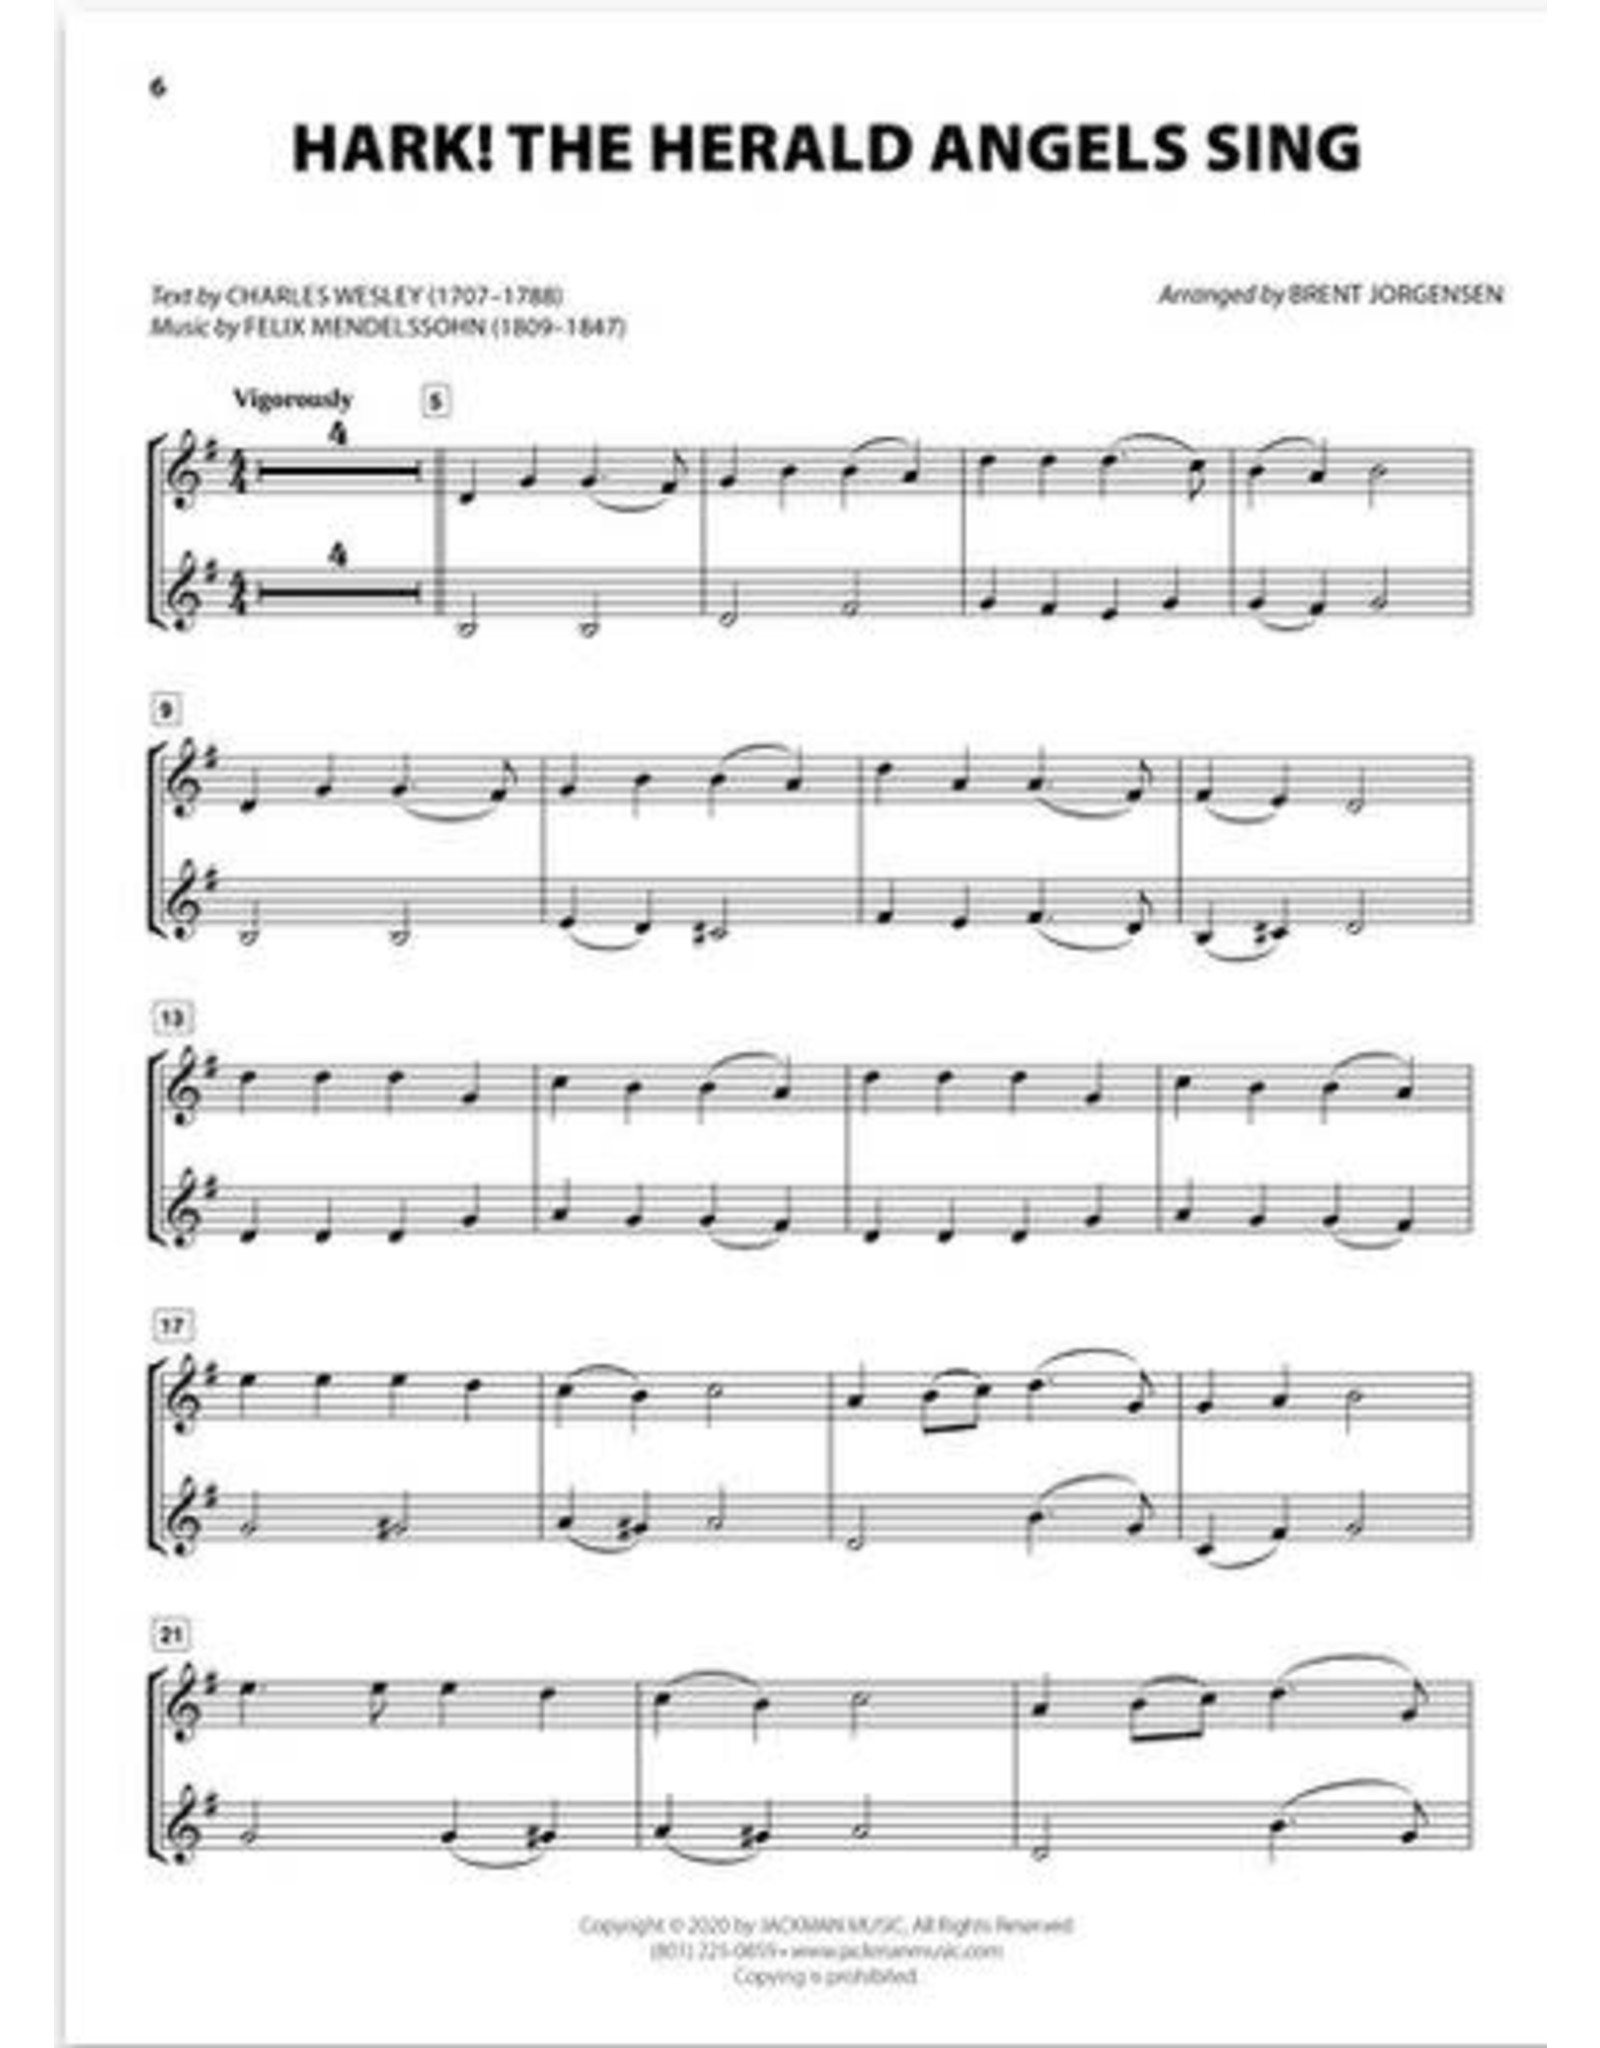 Jackman Music Christmas Hymn-Alongs - arr. Brent Jorgensen - Trumpet